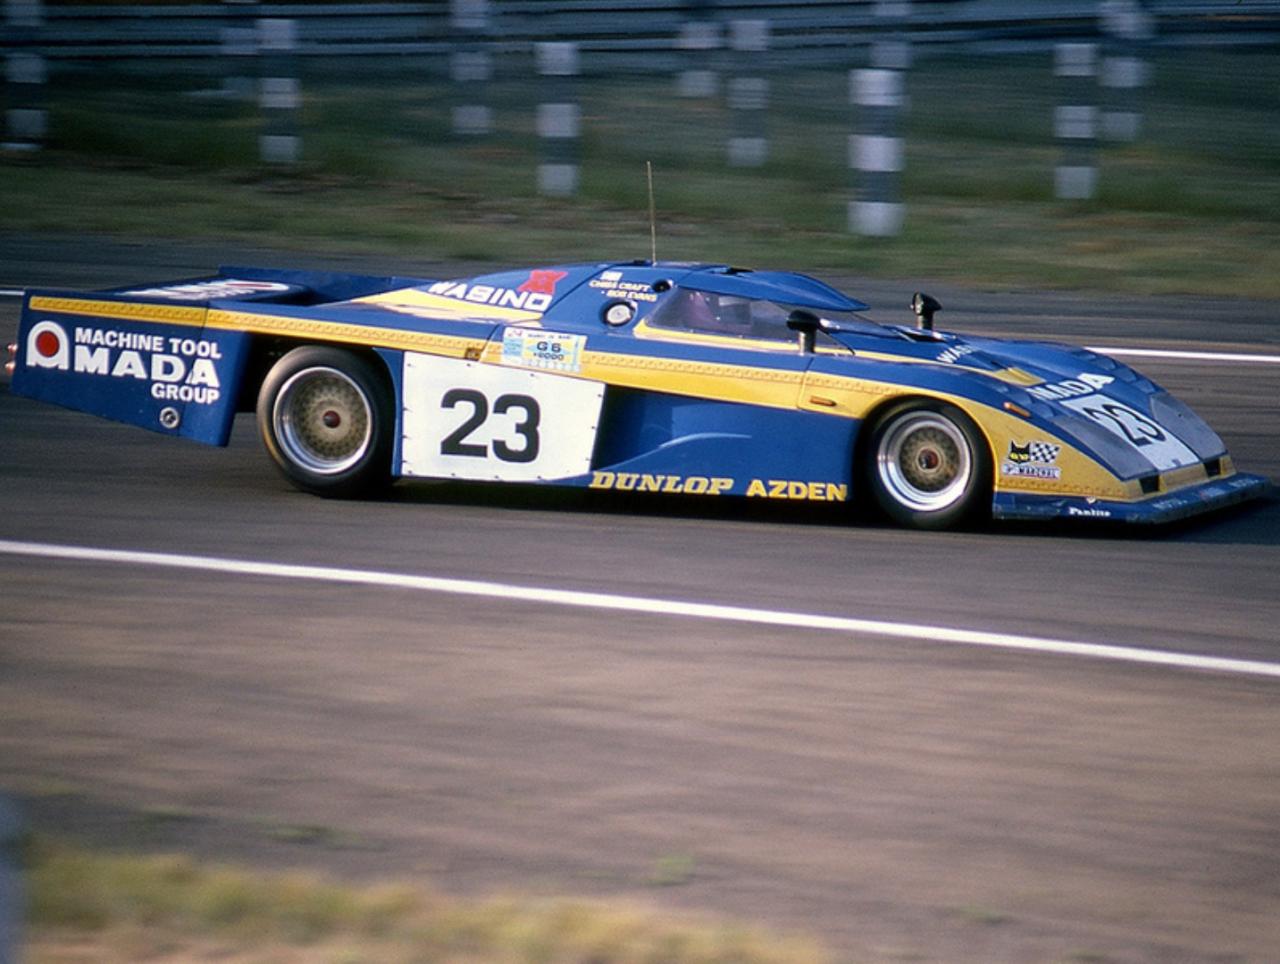 Chris Craft Bob Evans Dome Zero Rl81 Ford Dome Co Ltd Xlix Grand Prix D Endurance Les 24 Heures Du Mans 1981 Worl Car Guys Sport Cars Vintage Racing